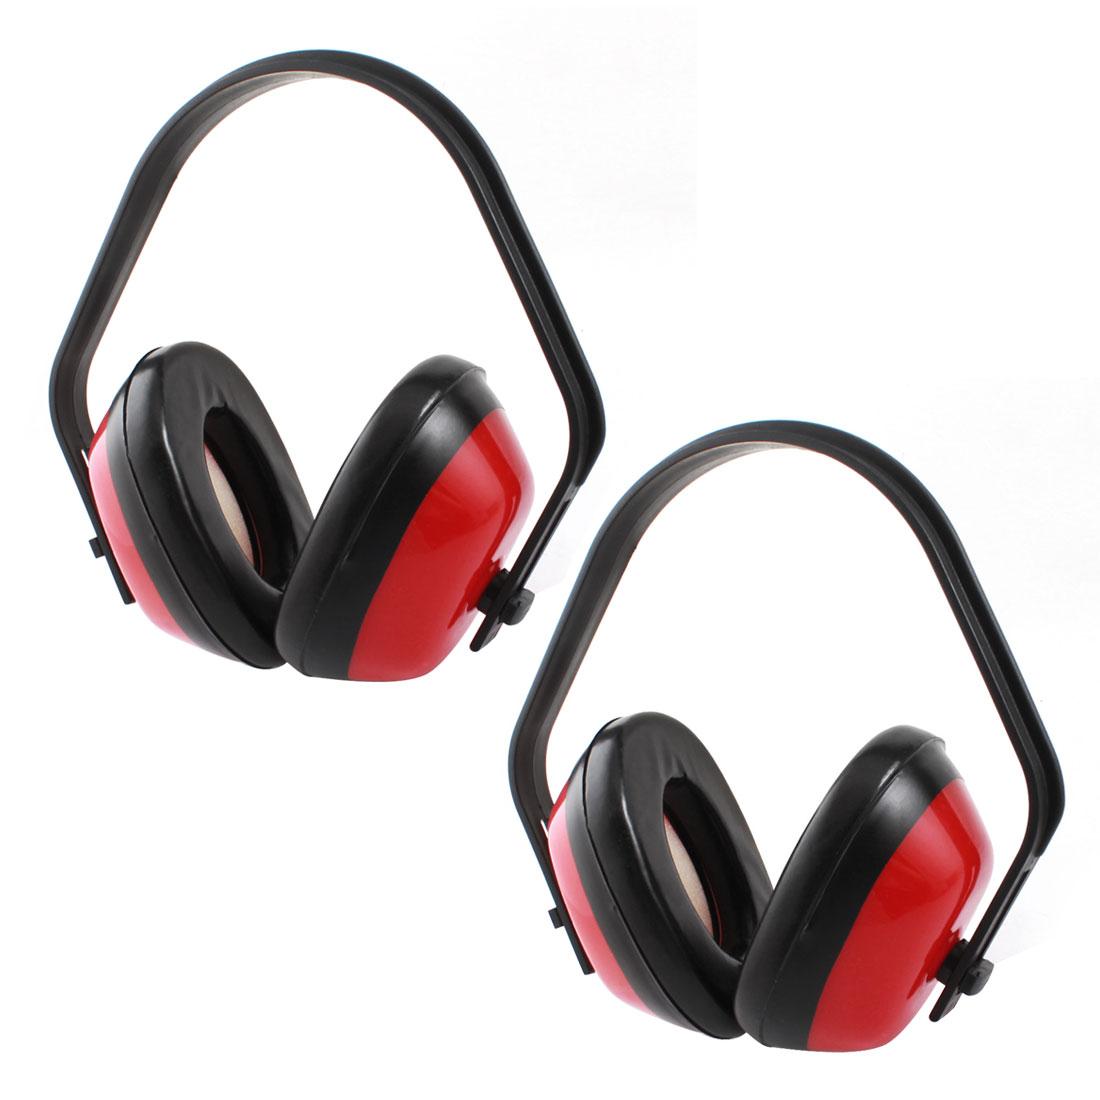 Industrial Sponge Earpad Noise Reduction Ear Muffs Hearing Protector 2PCS